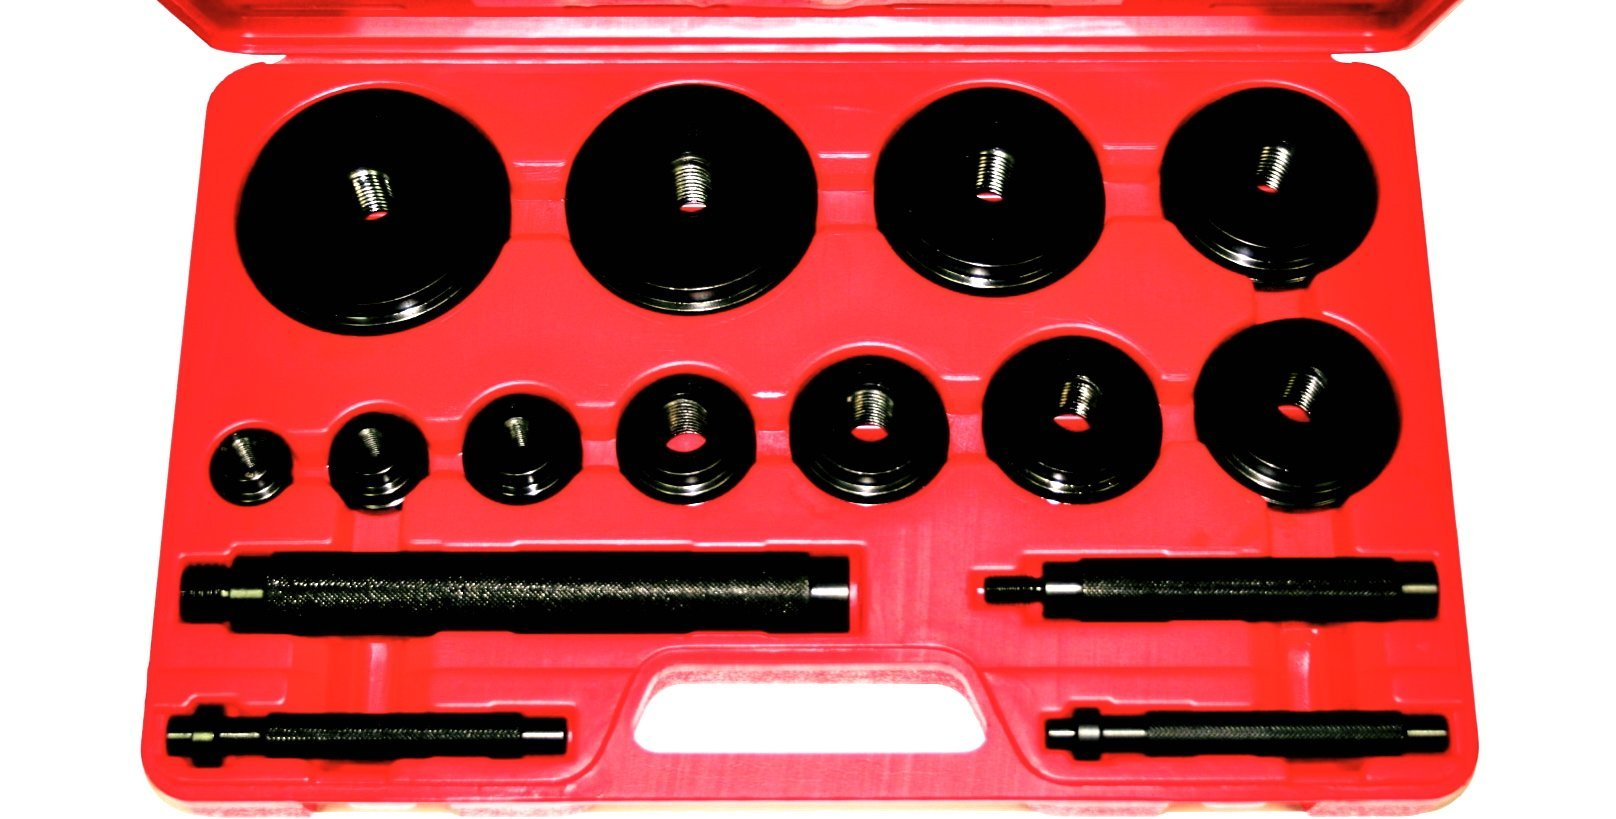 T&E Tools 9006 1/2'' - 3 1/2'' Bush, Seal, Bearing Driver Set